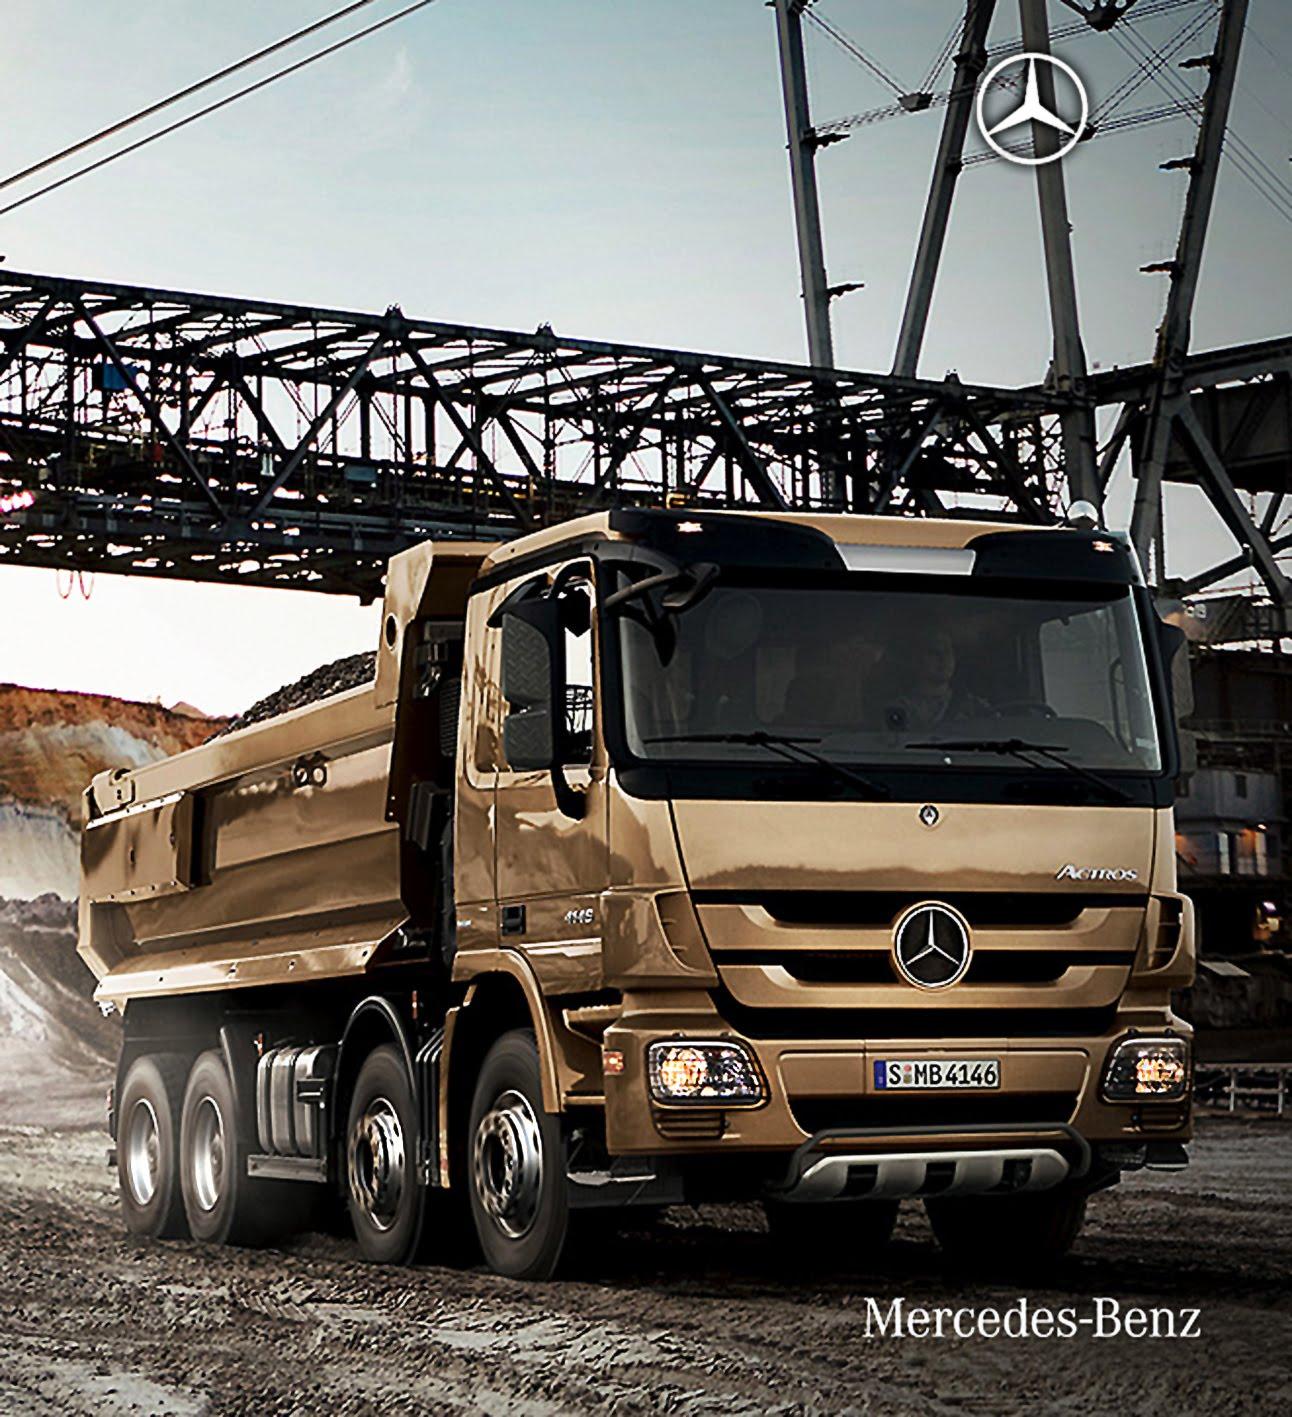 camiones mercedes benz en alemania. Black Bedroom Furniture Sets. Home Design Ideas